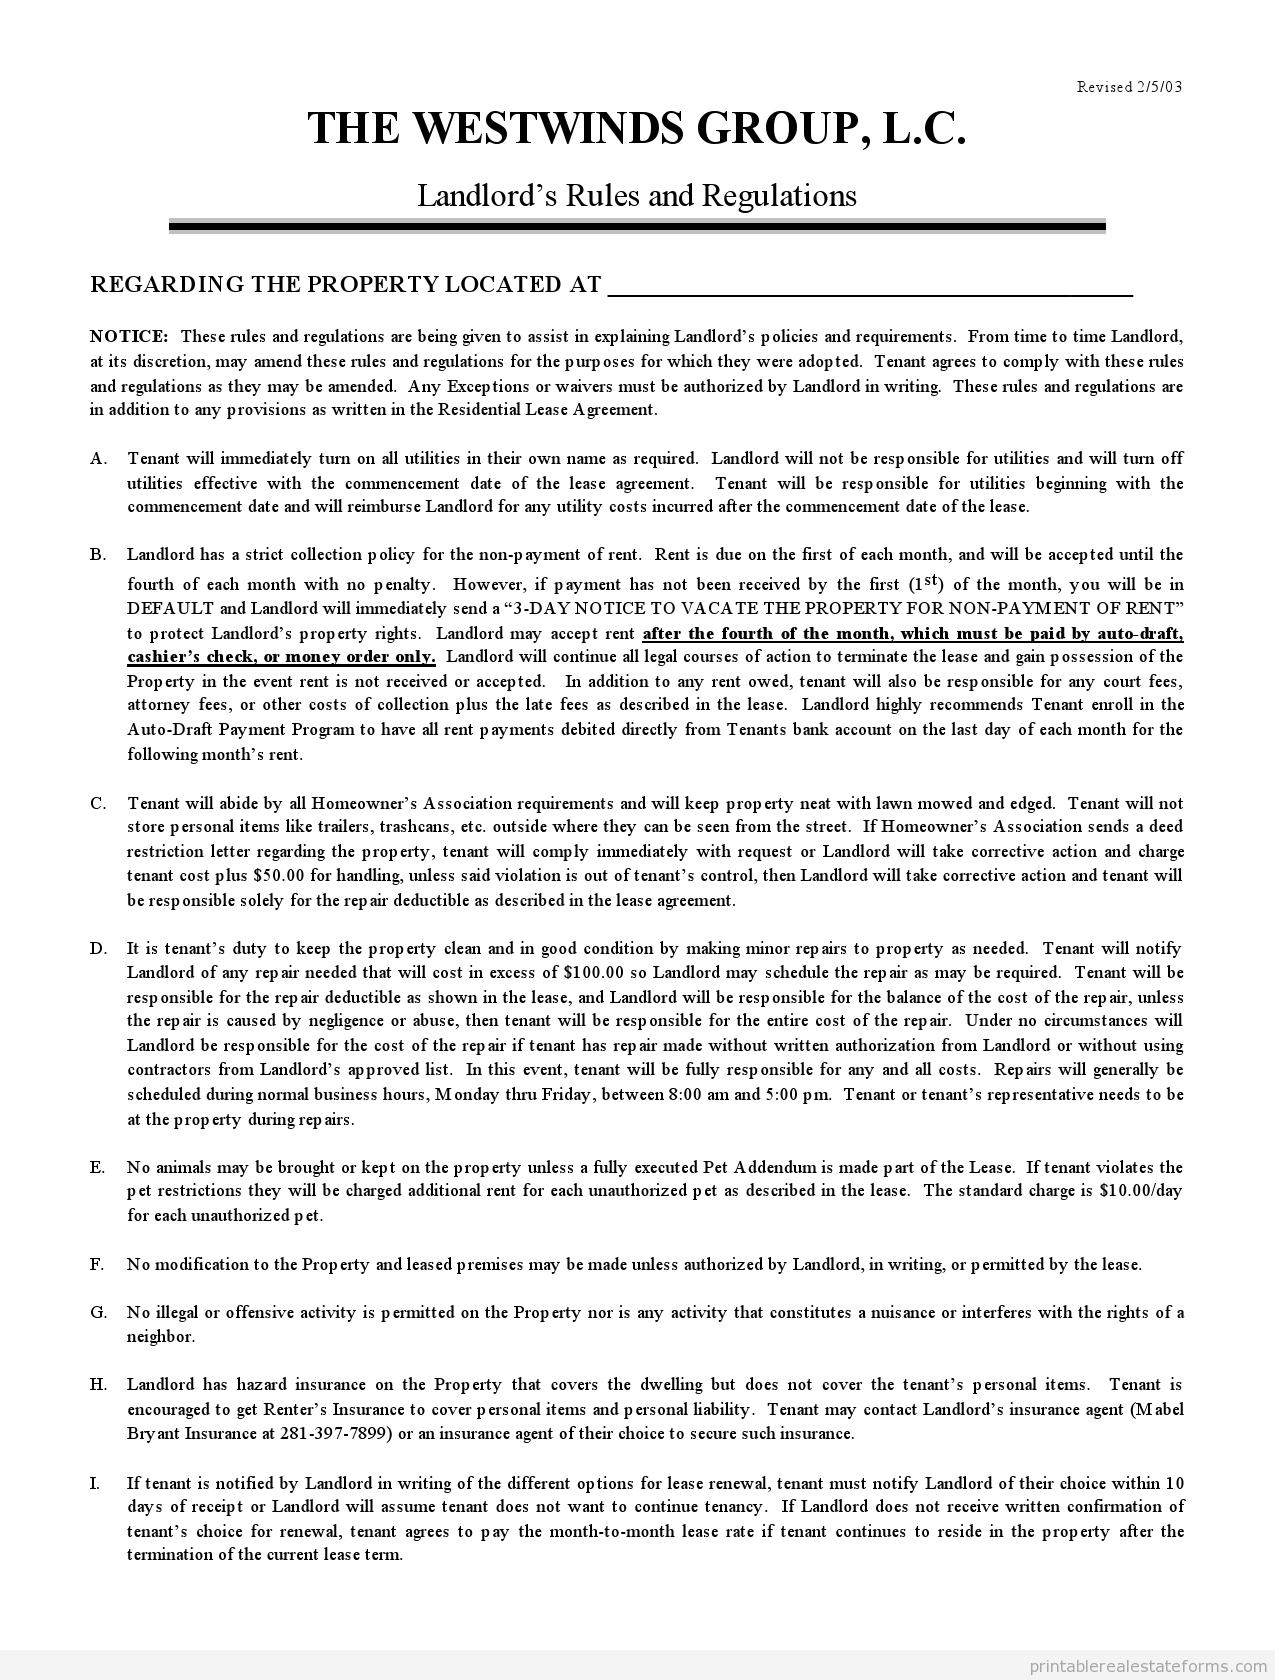 printable landlord u0026 39 s rules and regulations 2 form  pdf